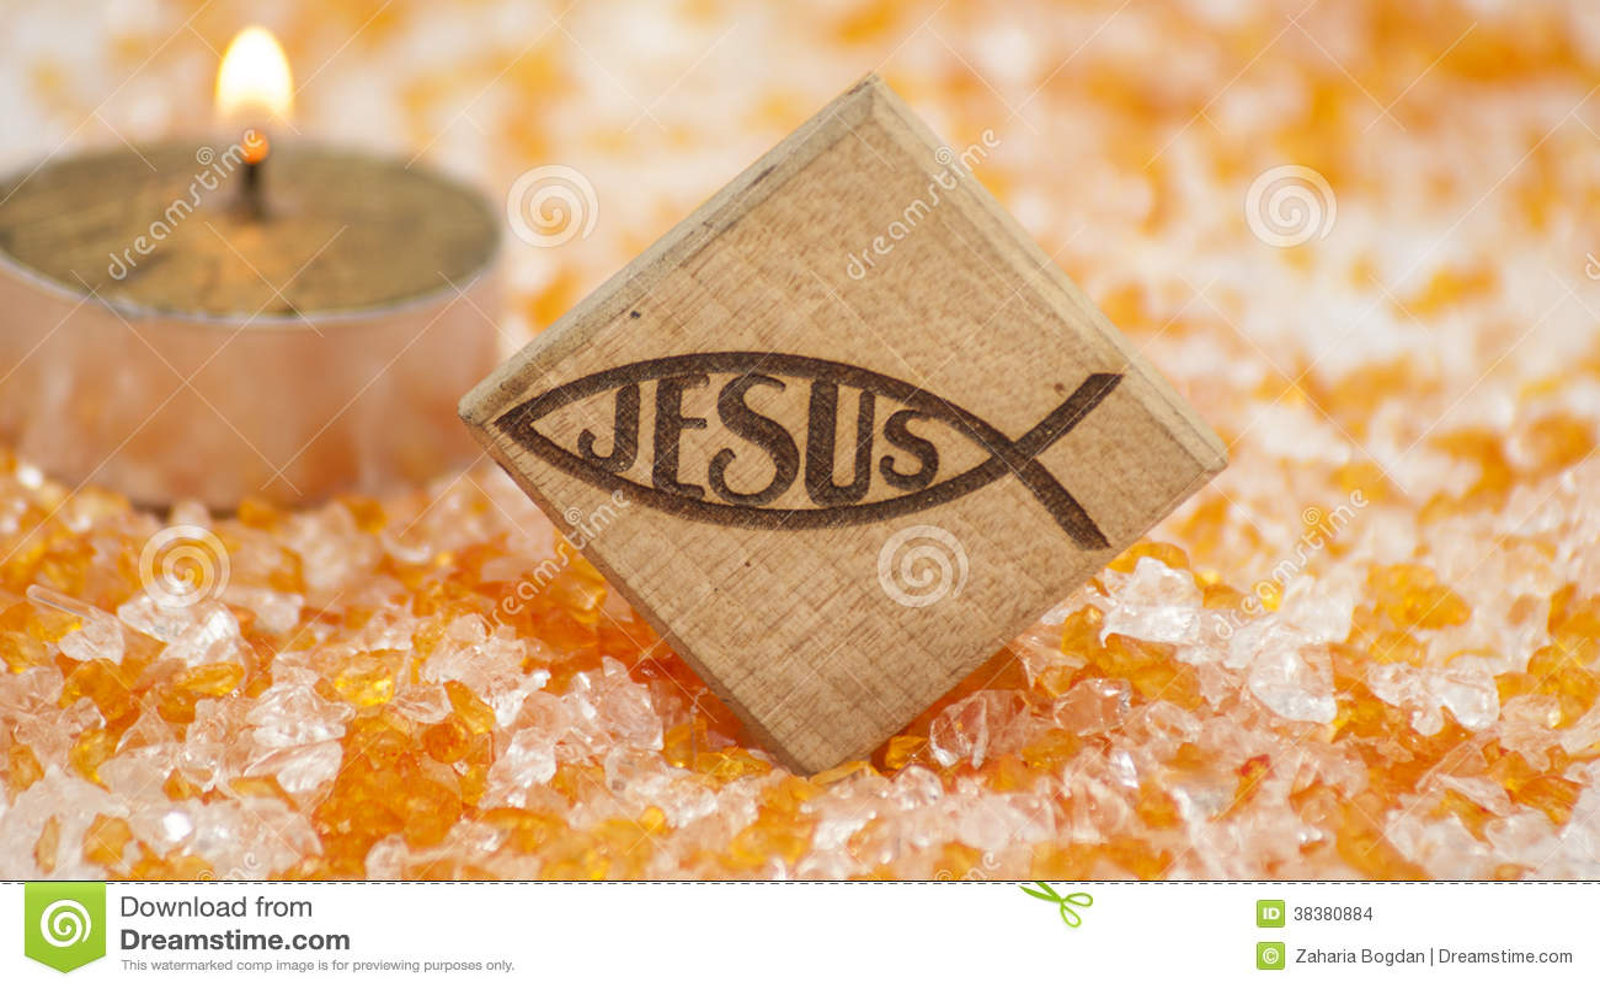 Jesus Name In Christian Symbol Stock Photo Image Of Symbolic